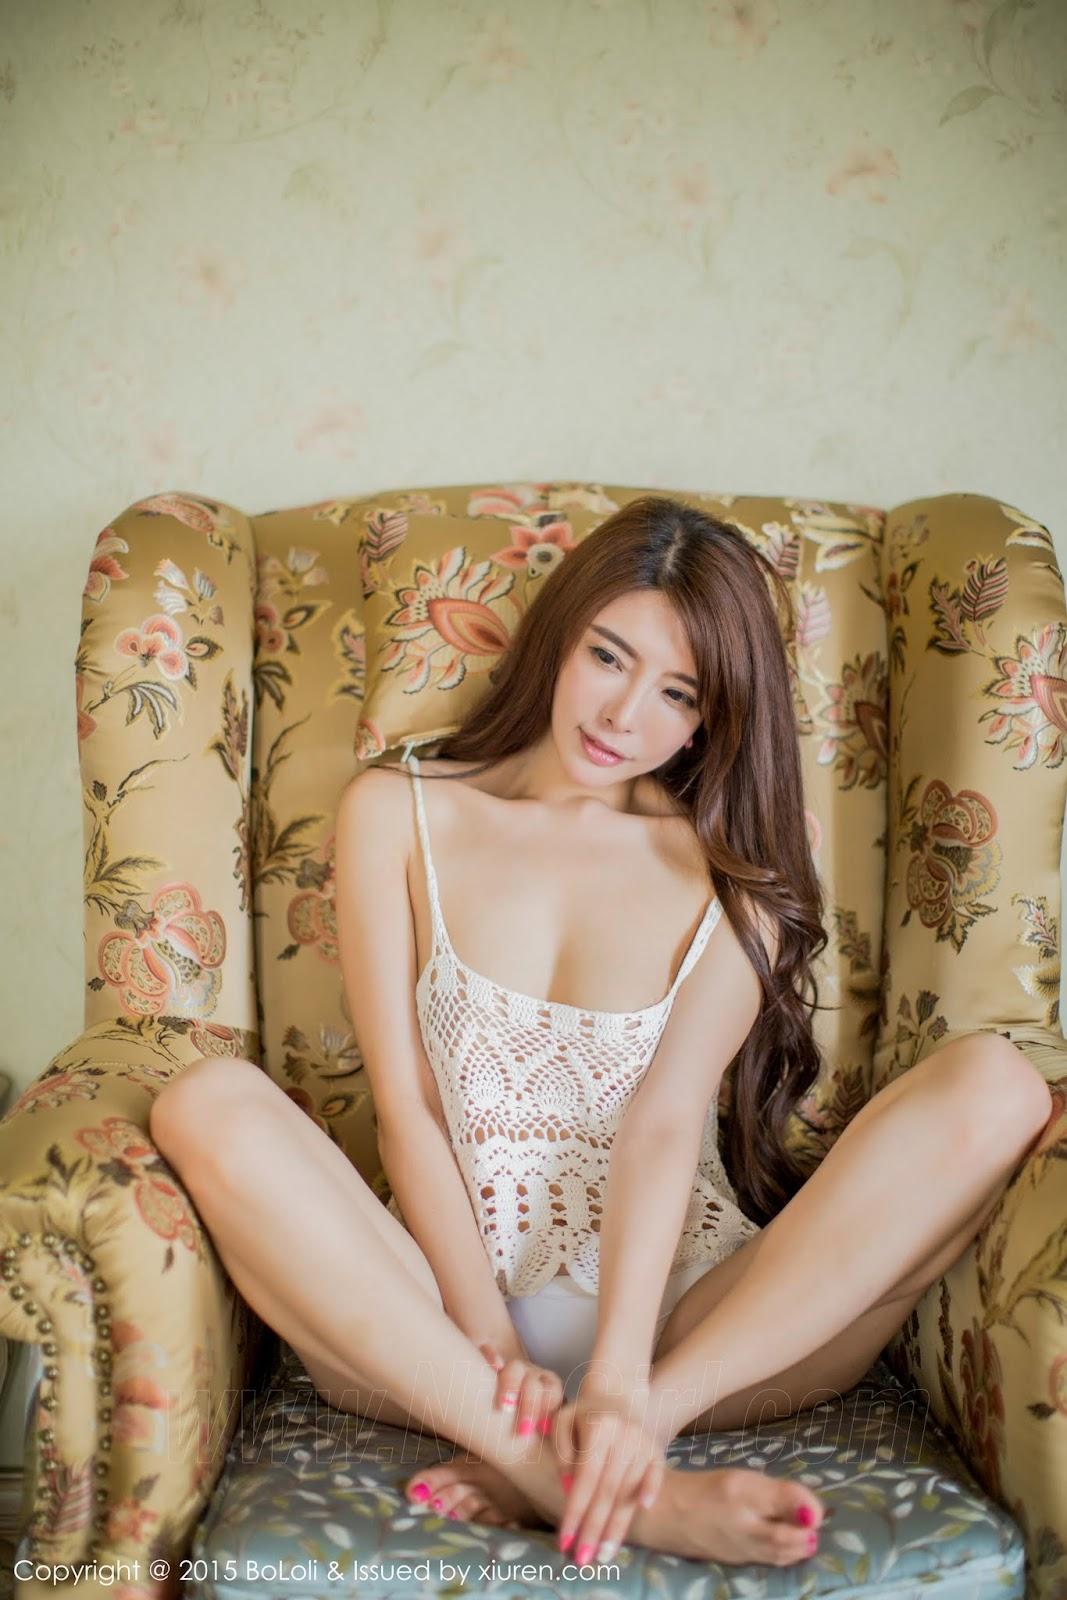 BOLOLI VOL.36 Model: 夏小秋秋秋